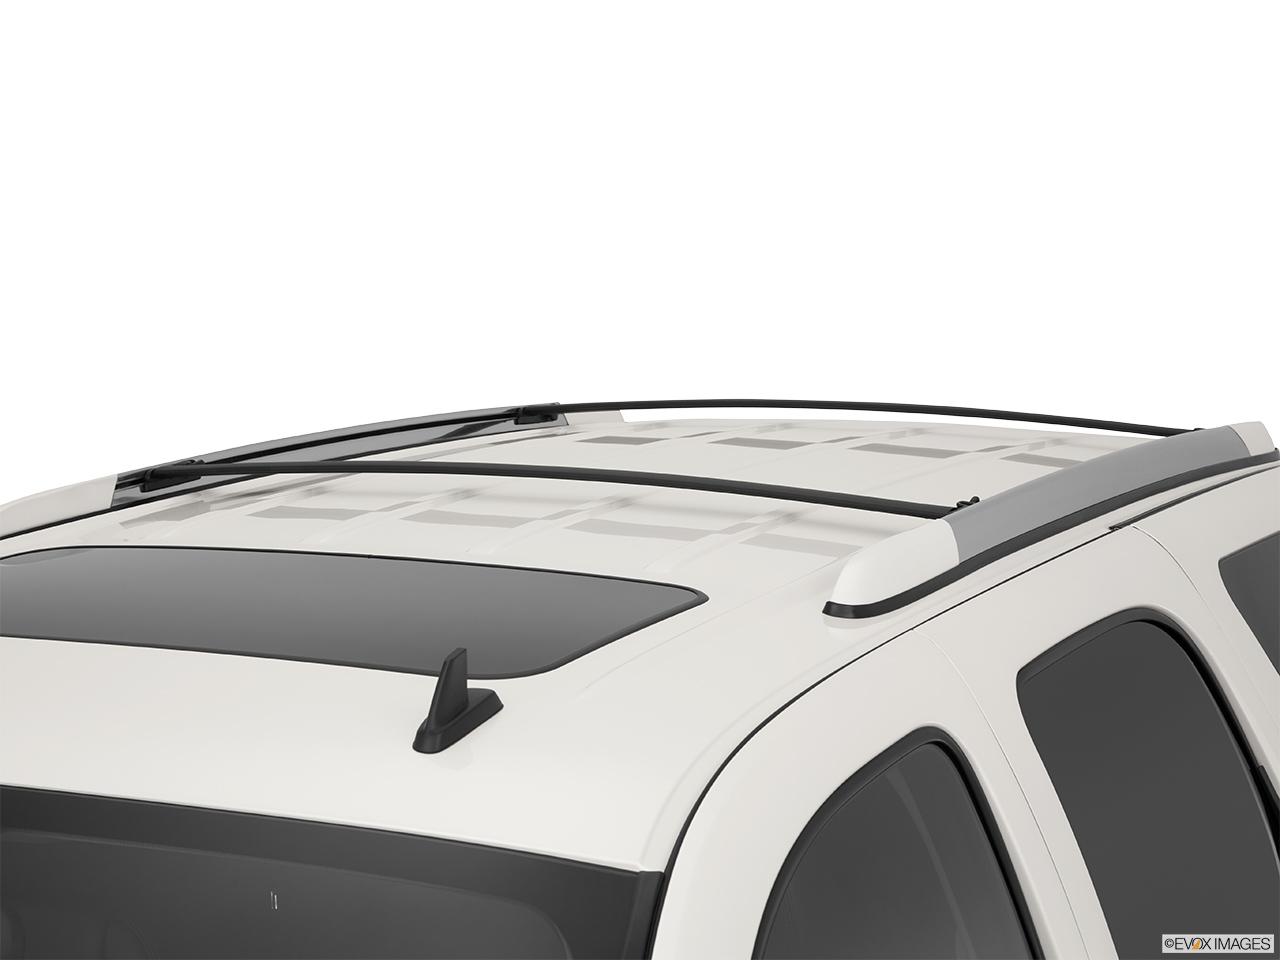 2014 GMC Yukon 2WD 4 Door SLE   Roof Rack Props